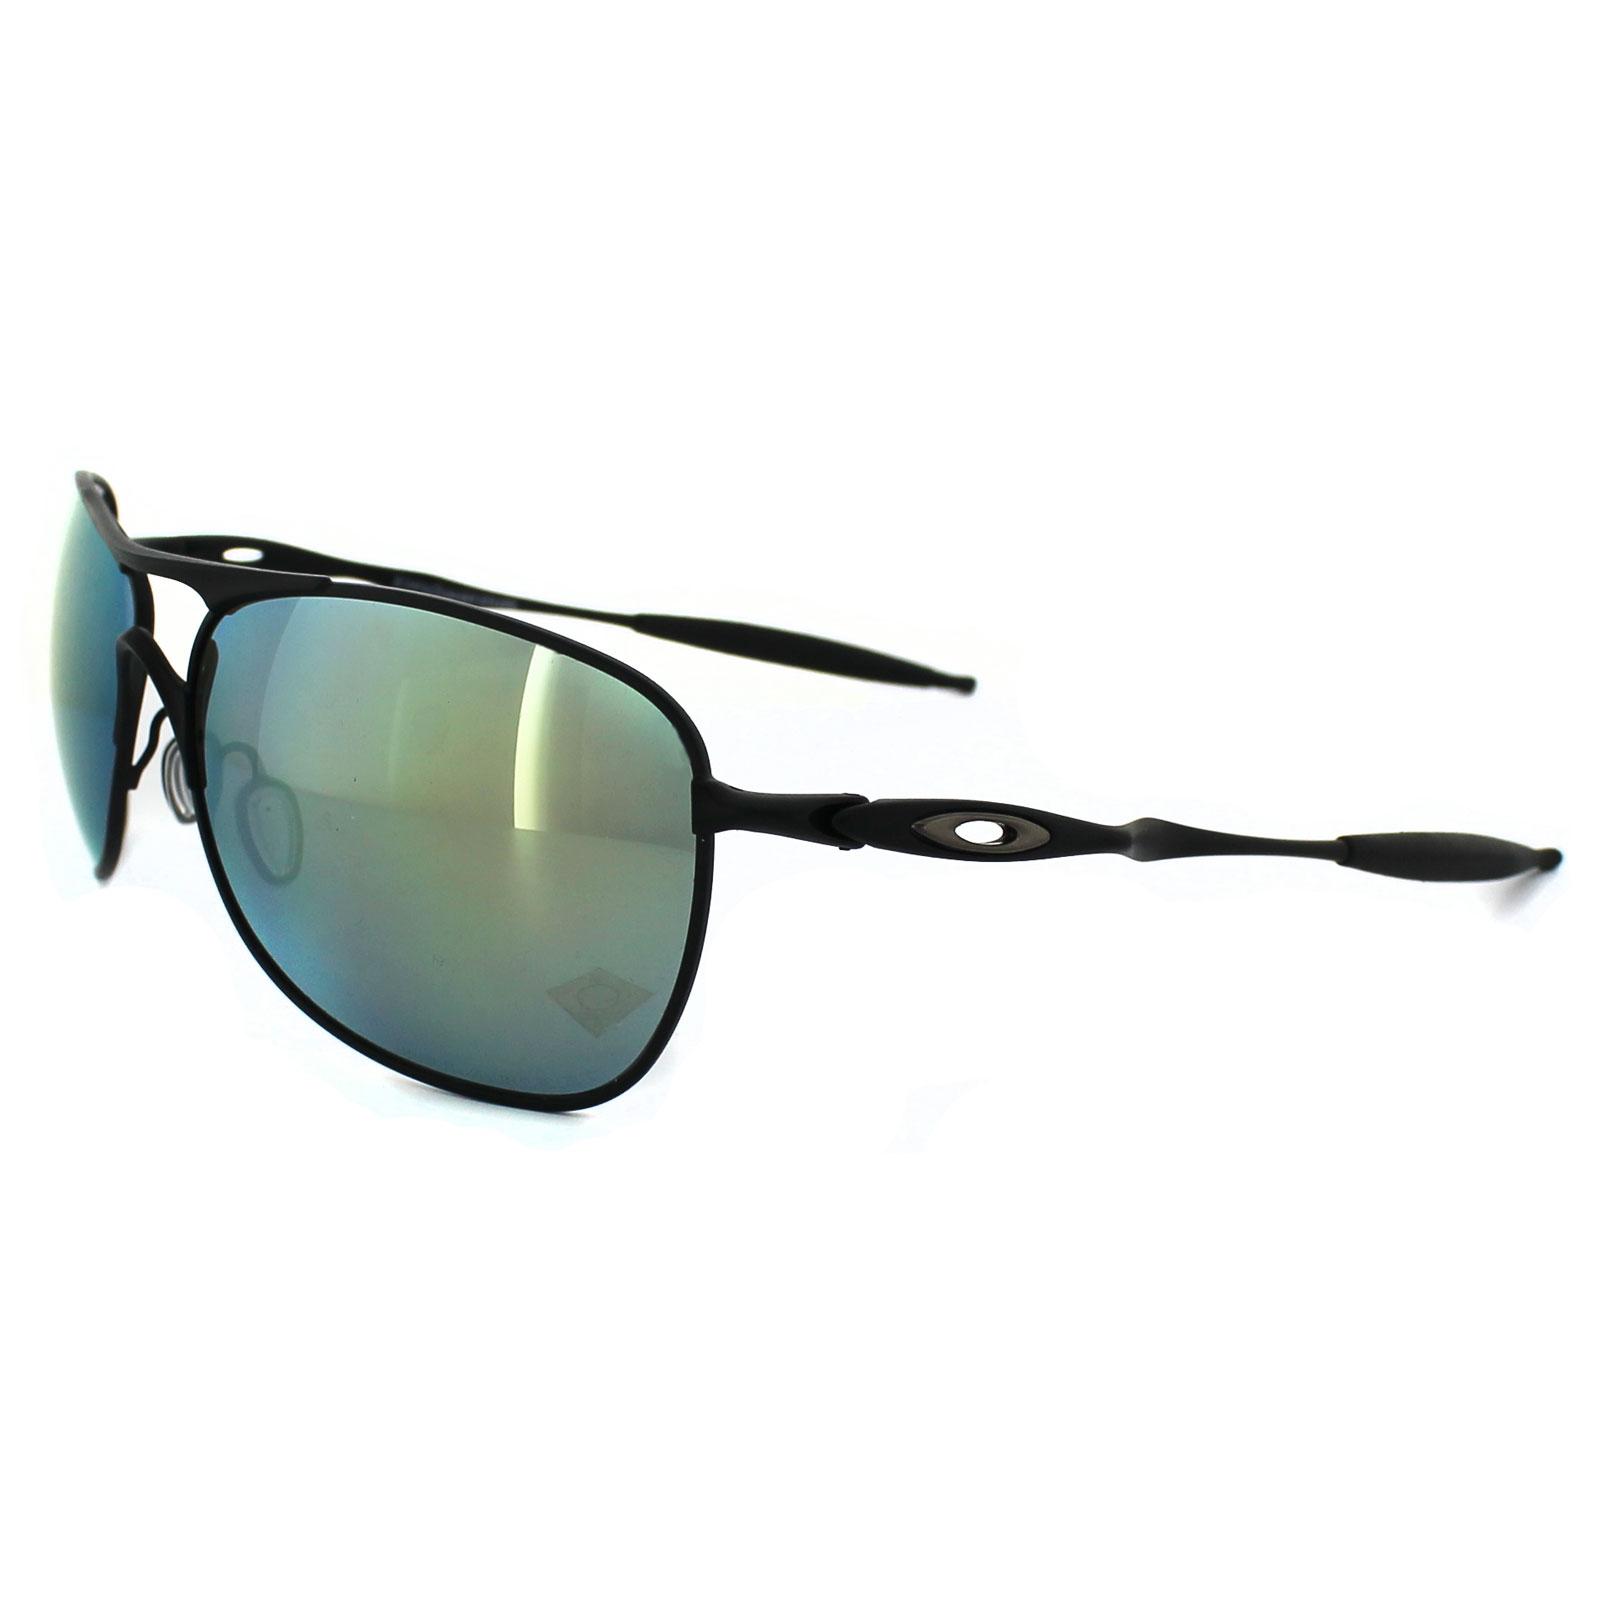 b2d3df7b0a Oakley Crosshair 2.0 Polarized Sunglasses « Heritage Malta